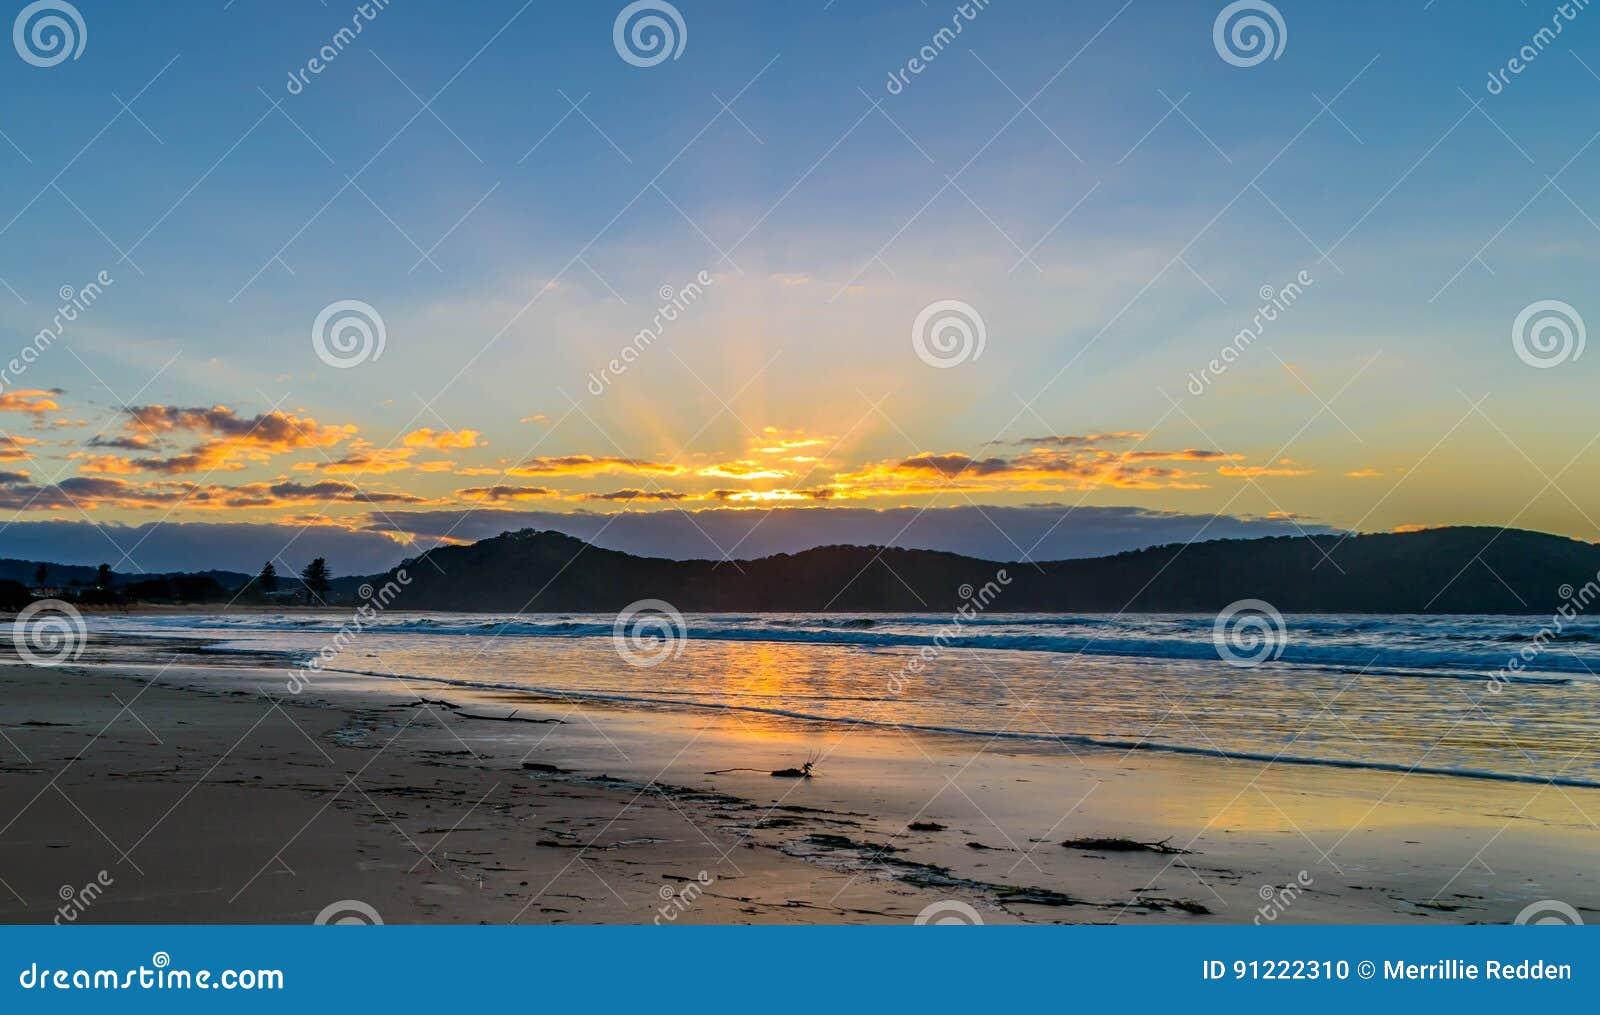 Sunrise Seascape and Crepuscular Rays